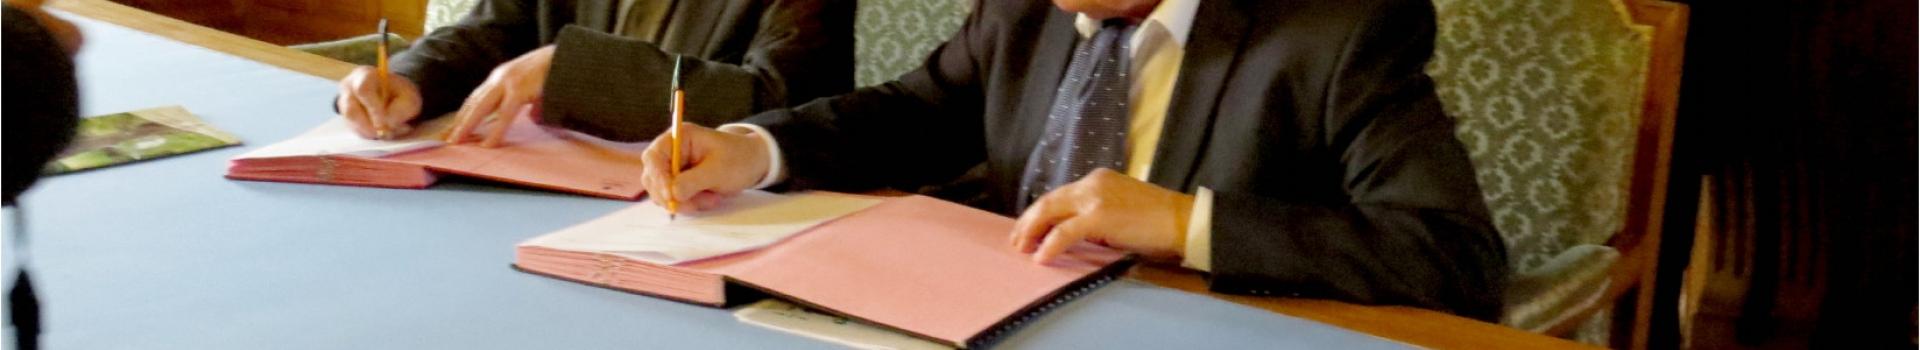 Signature d'une convention de partenariat